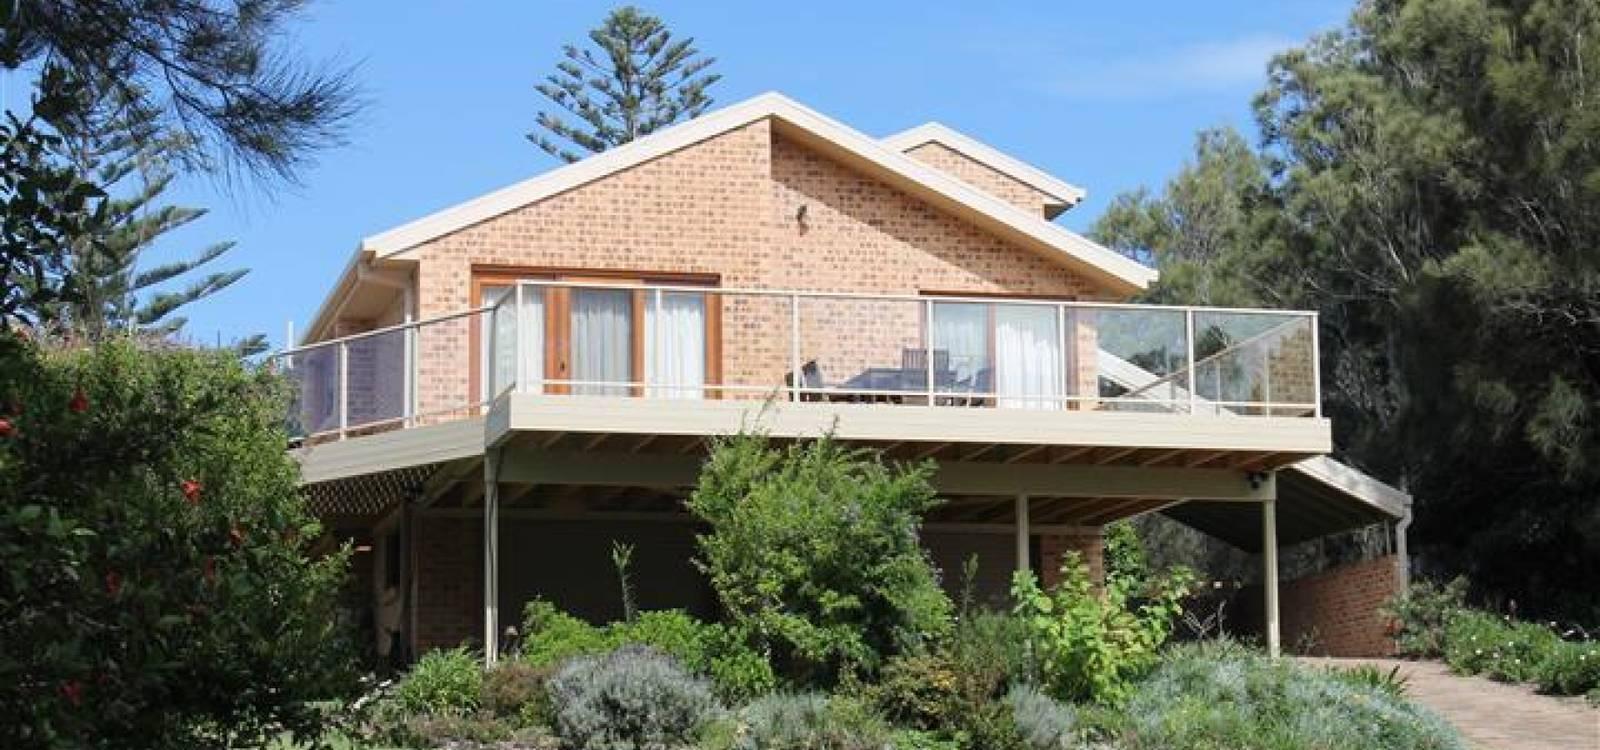 18 Chauvel Crescent TUROSS HEAD, NSW 2537 - photo 1